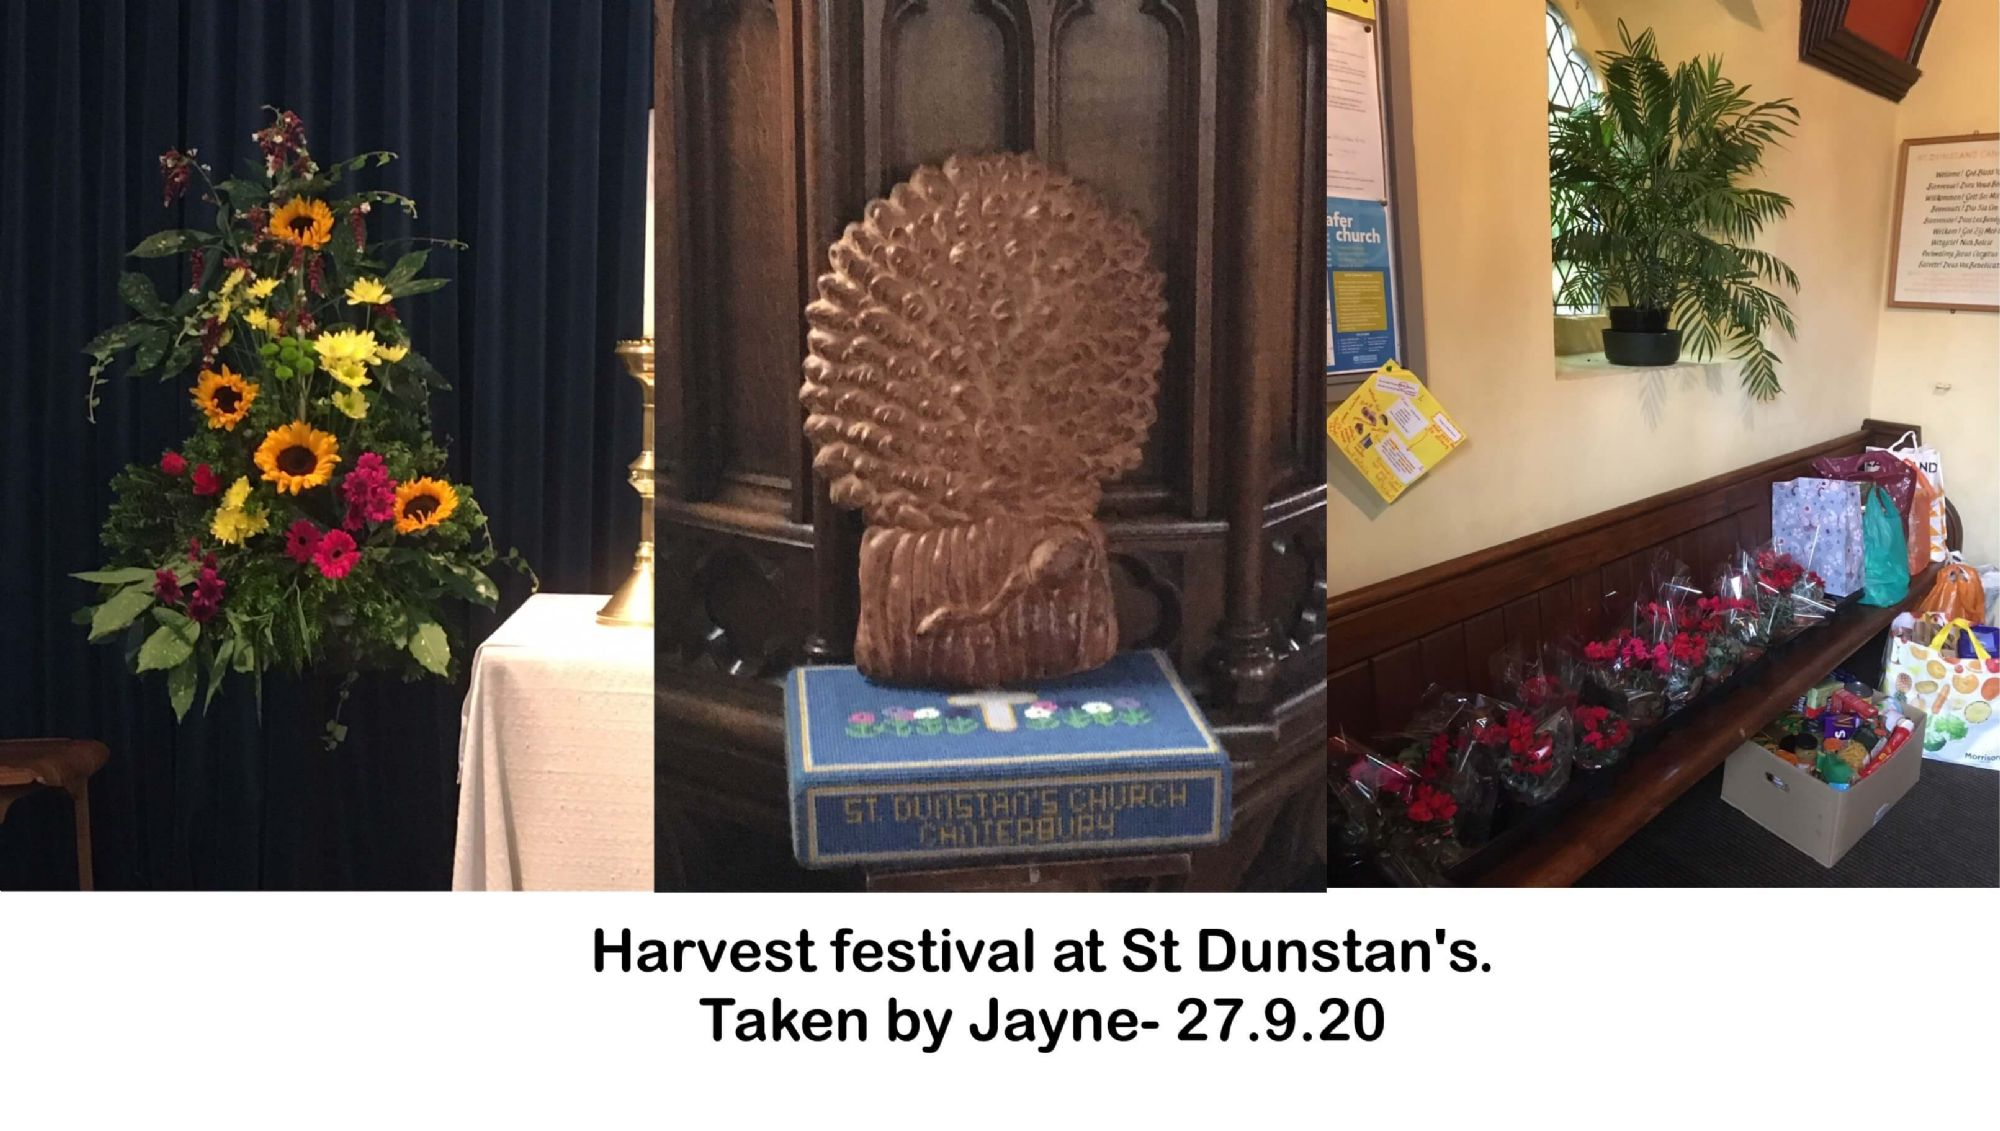 Harvest festival at St Dunstan's